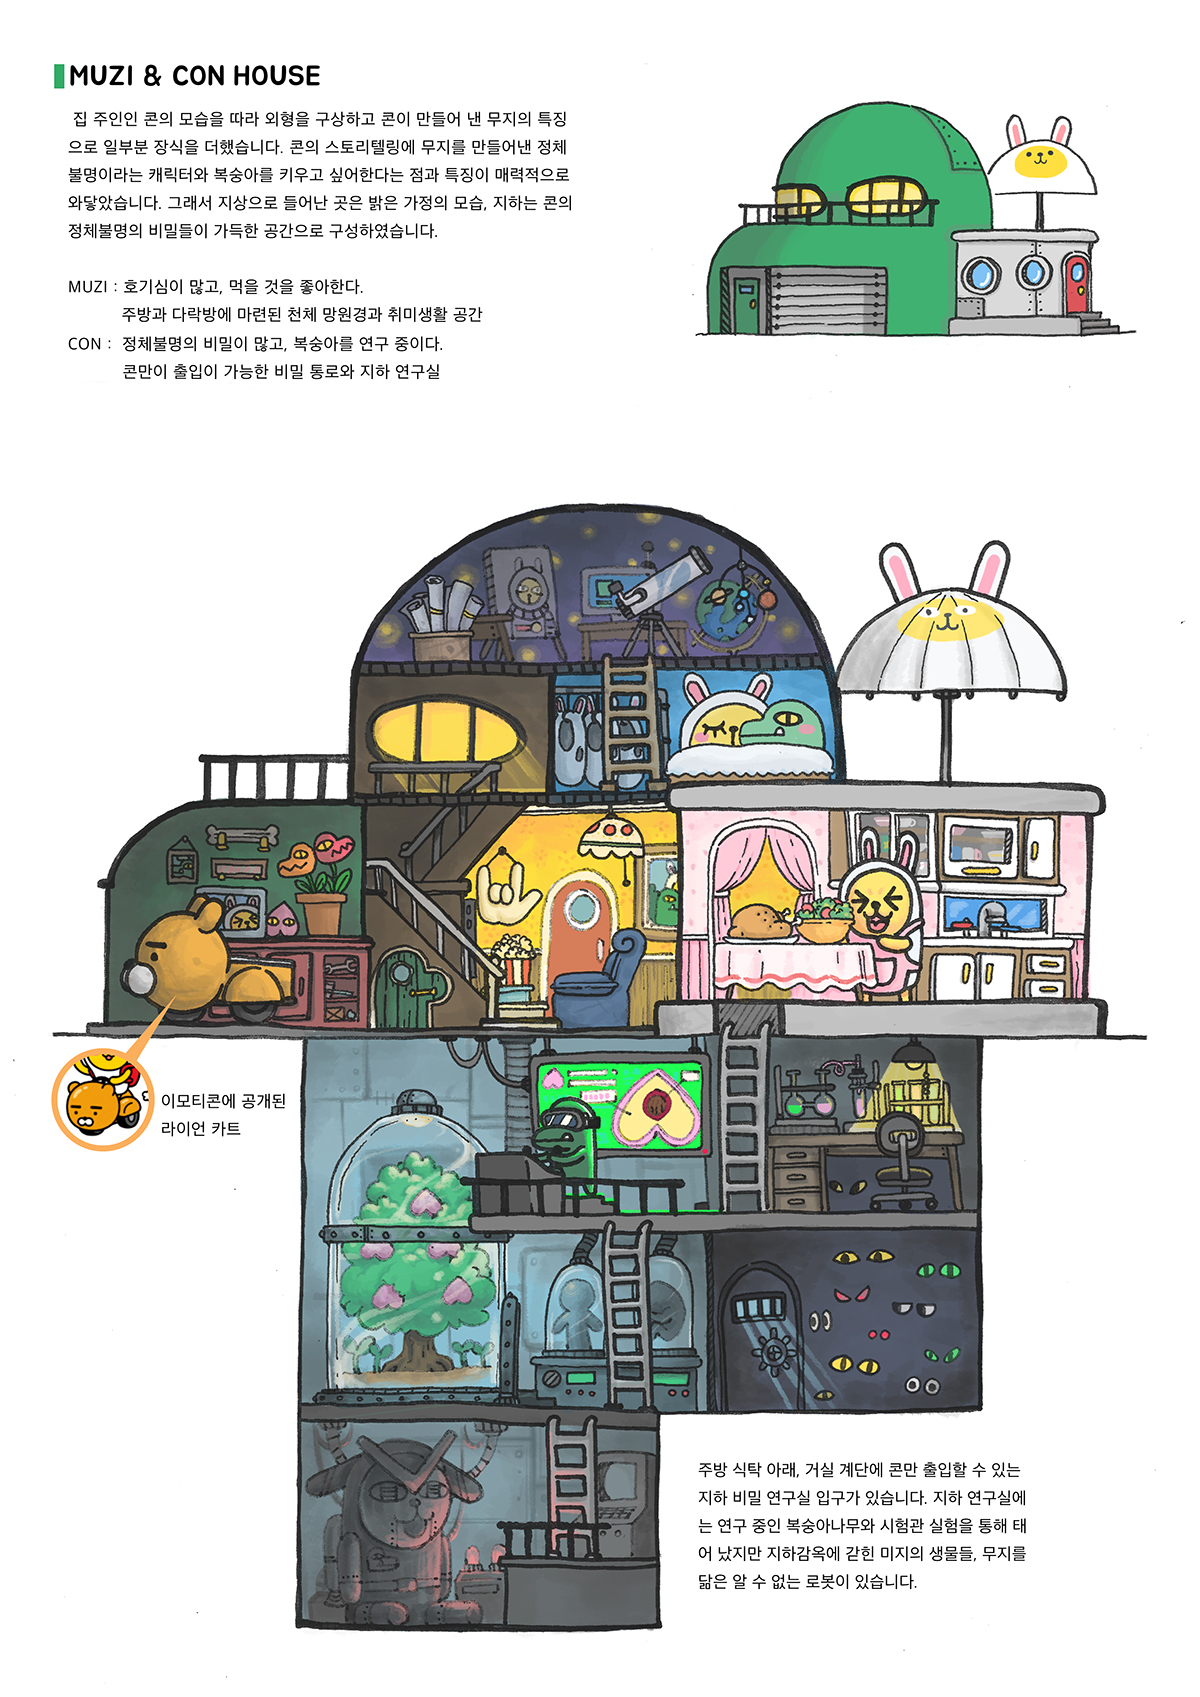 Wundervoll Conhouse Beste Wahl [ Muji & Con E ] Design